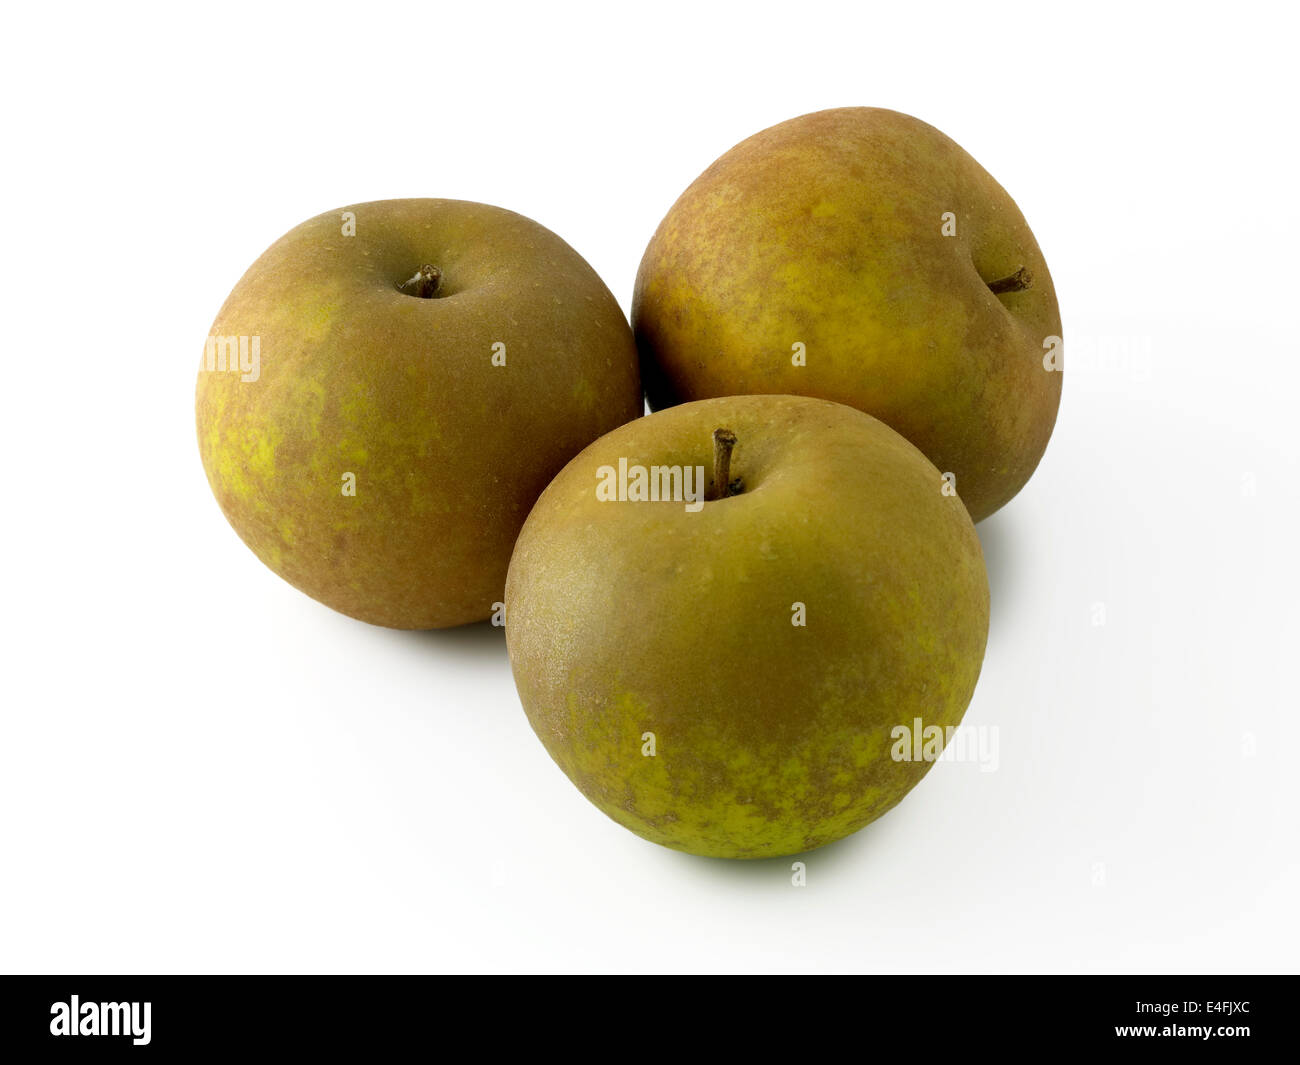 Egremont russet apple - Stock Image